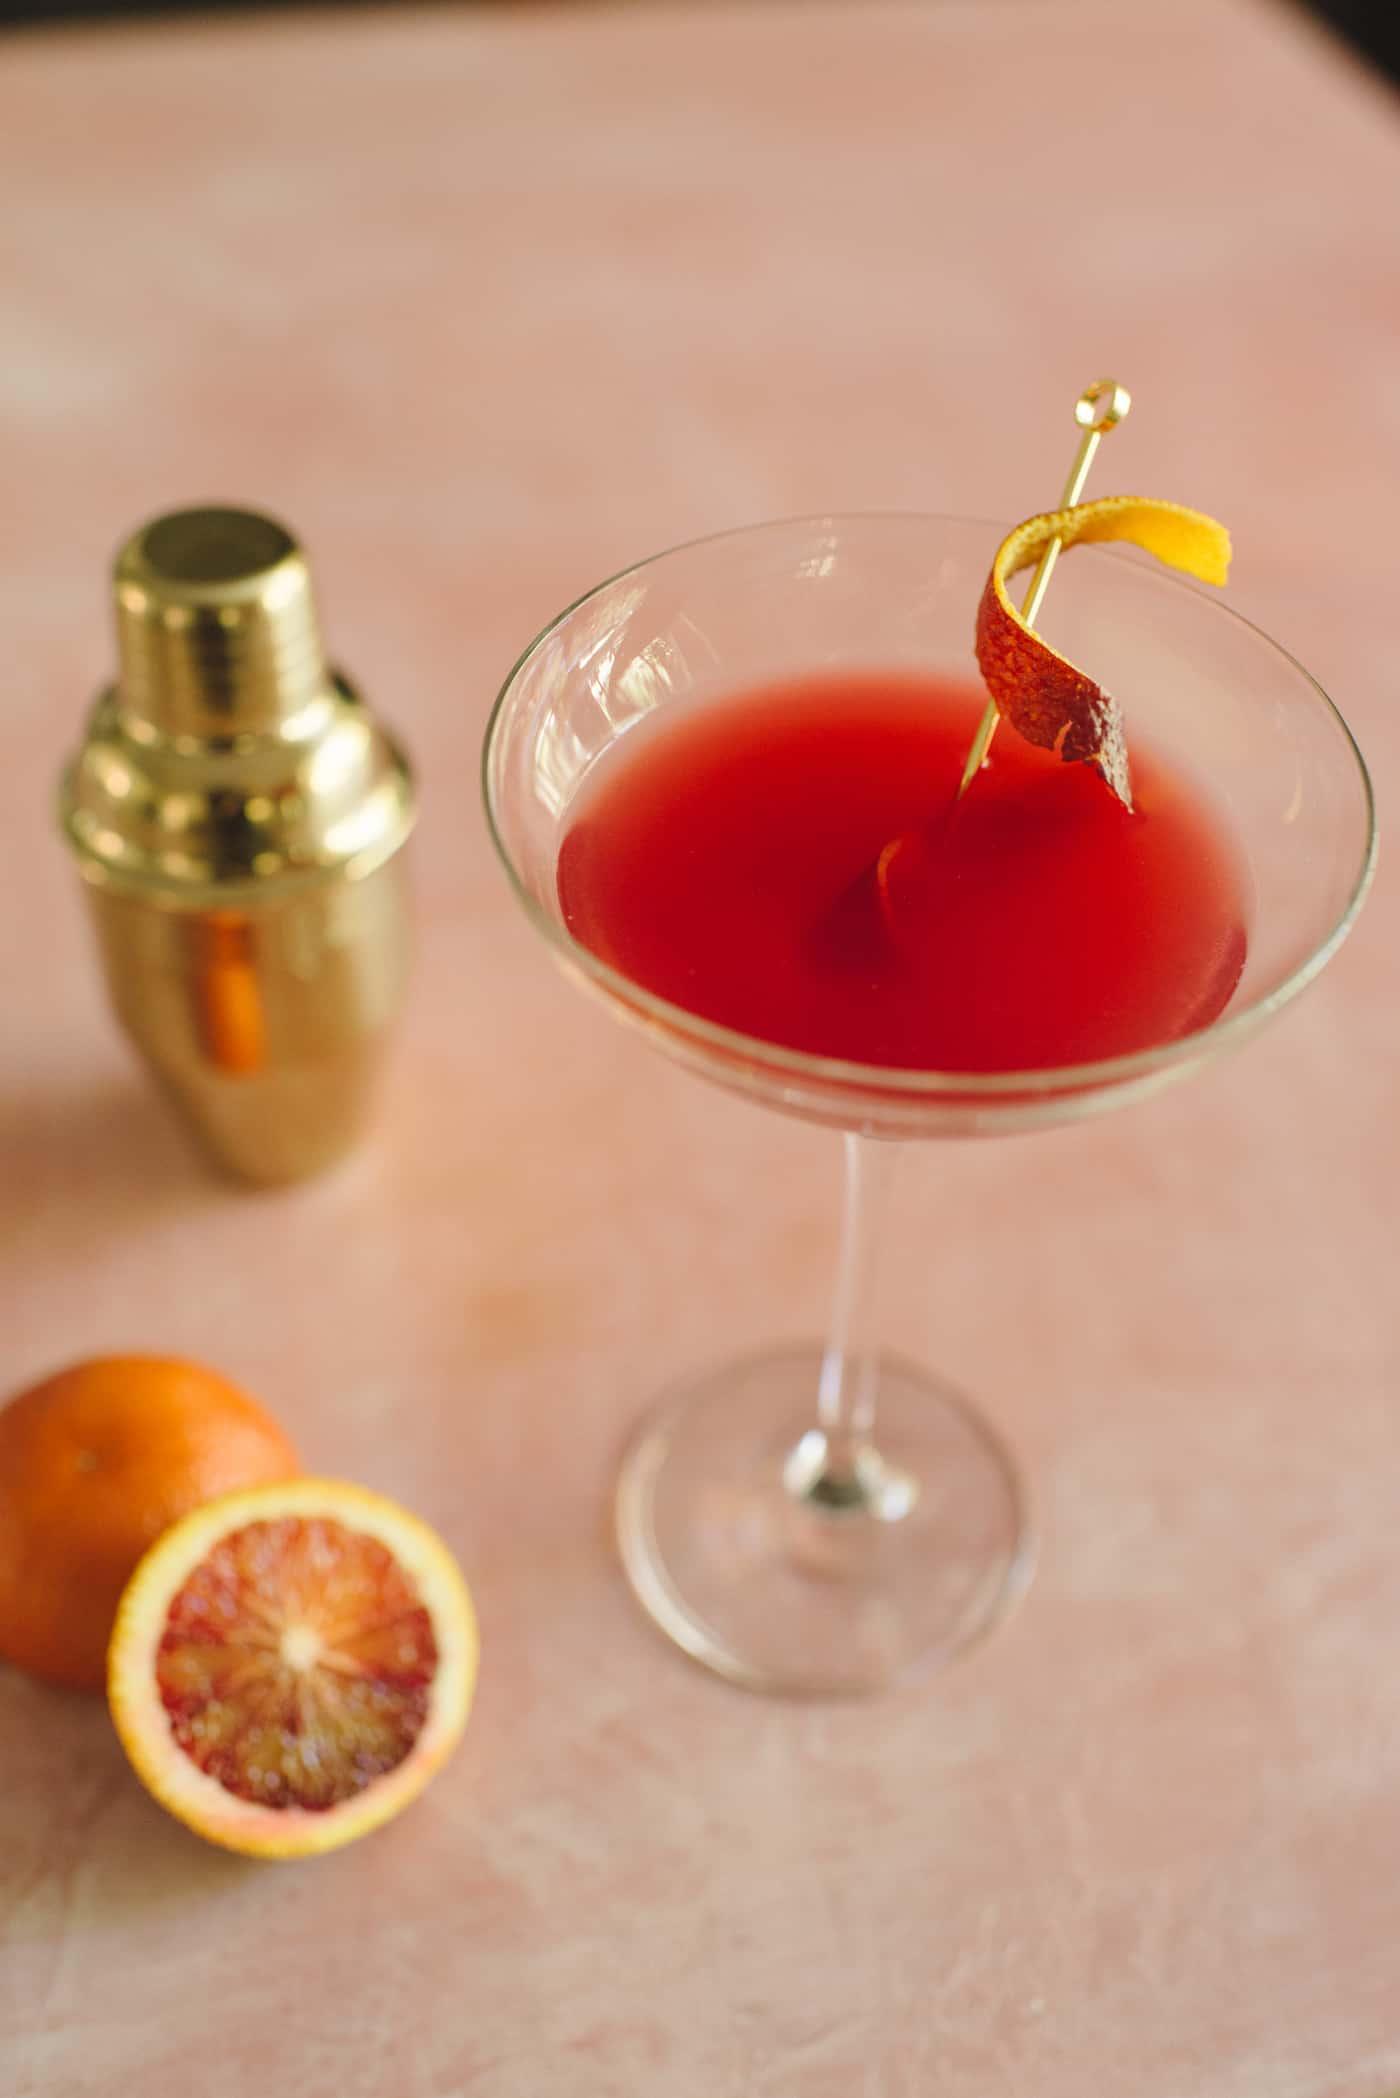 Blood Orange-Vanilla Martini Recipe by Tiffani Thiessen